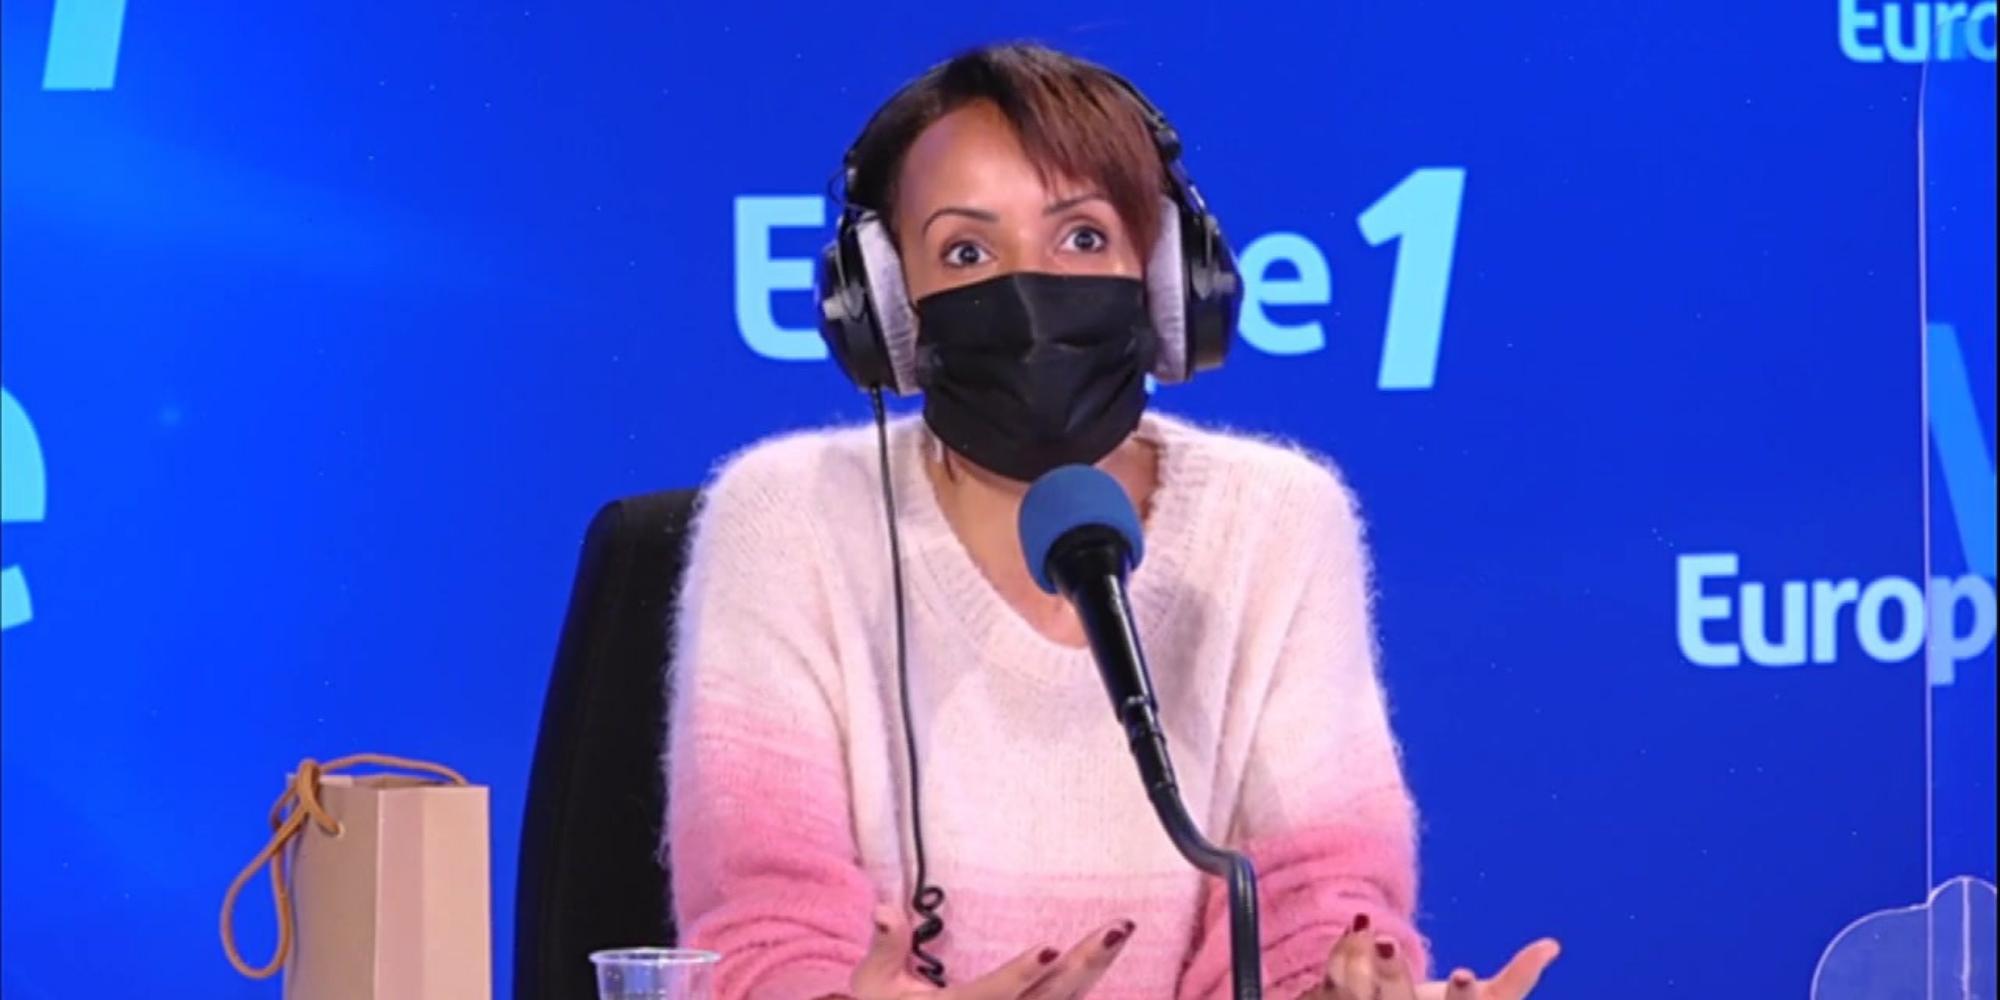 Sonia Rolland raconte son enfance, du faste du Rwanda aux HLM français - Europe 1